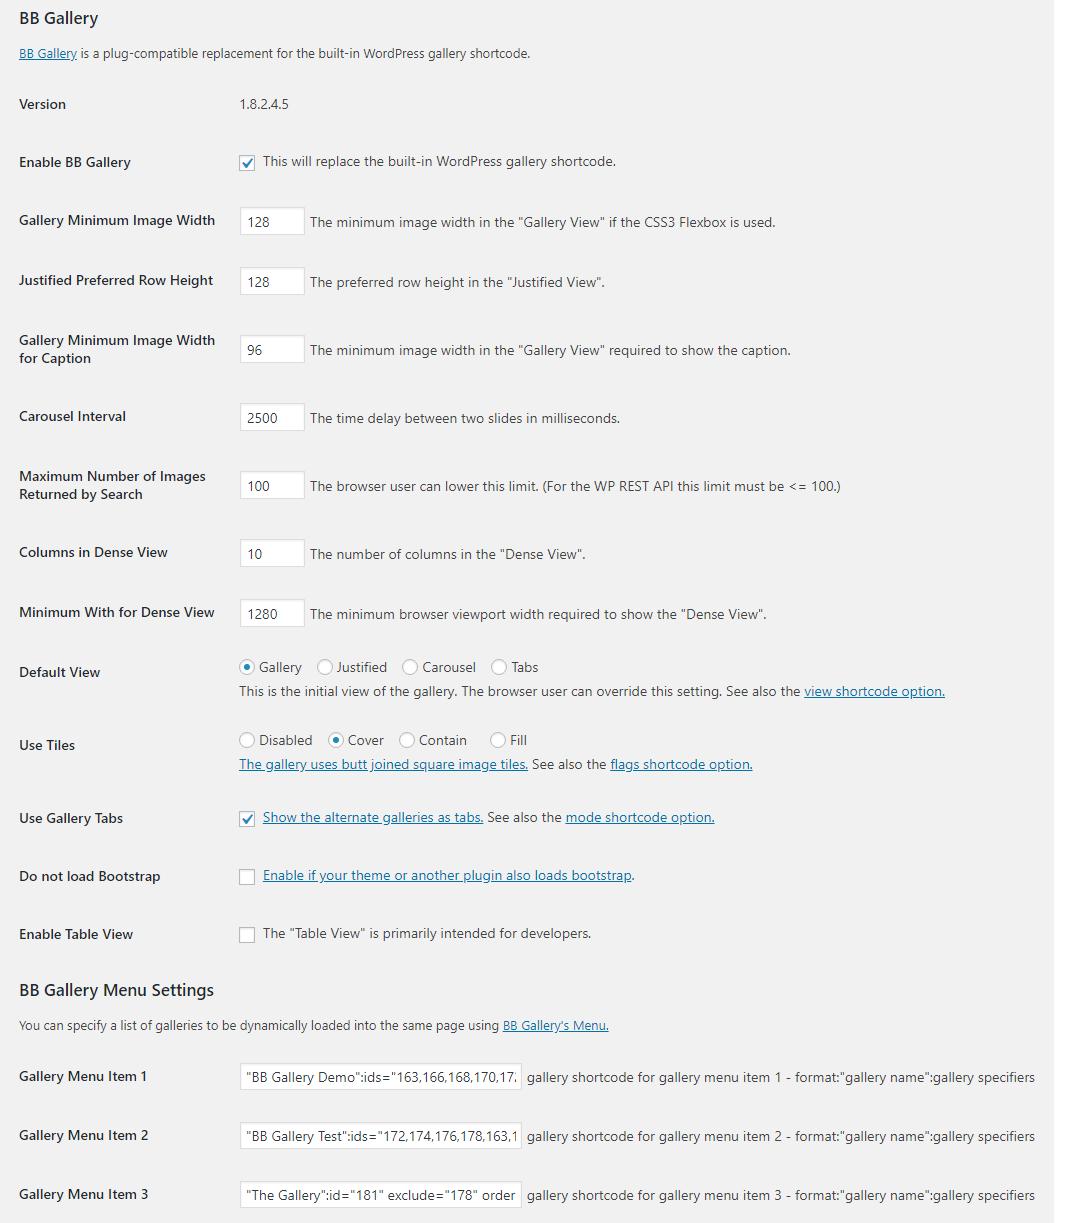 "<a href=""https://bbfgallery.wordpress.com/#installation"">Admin Settings</a>"